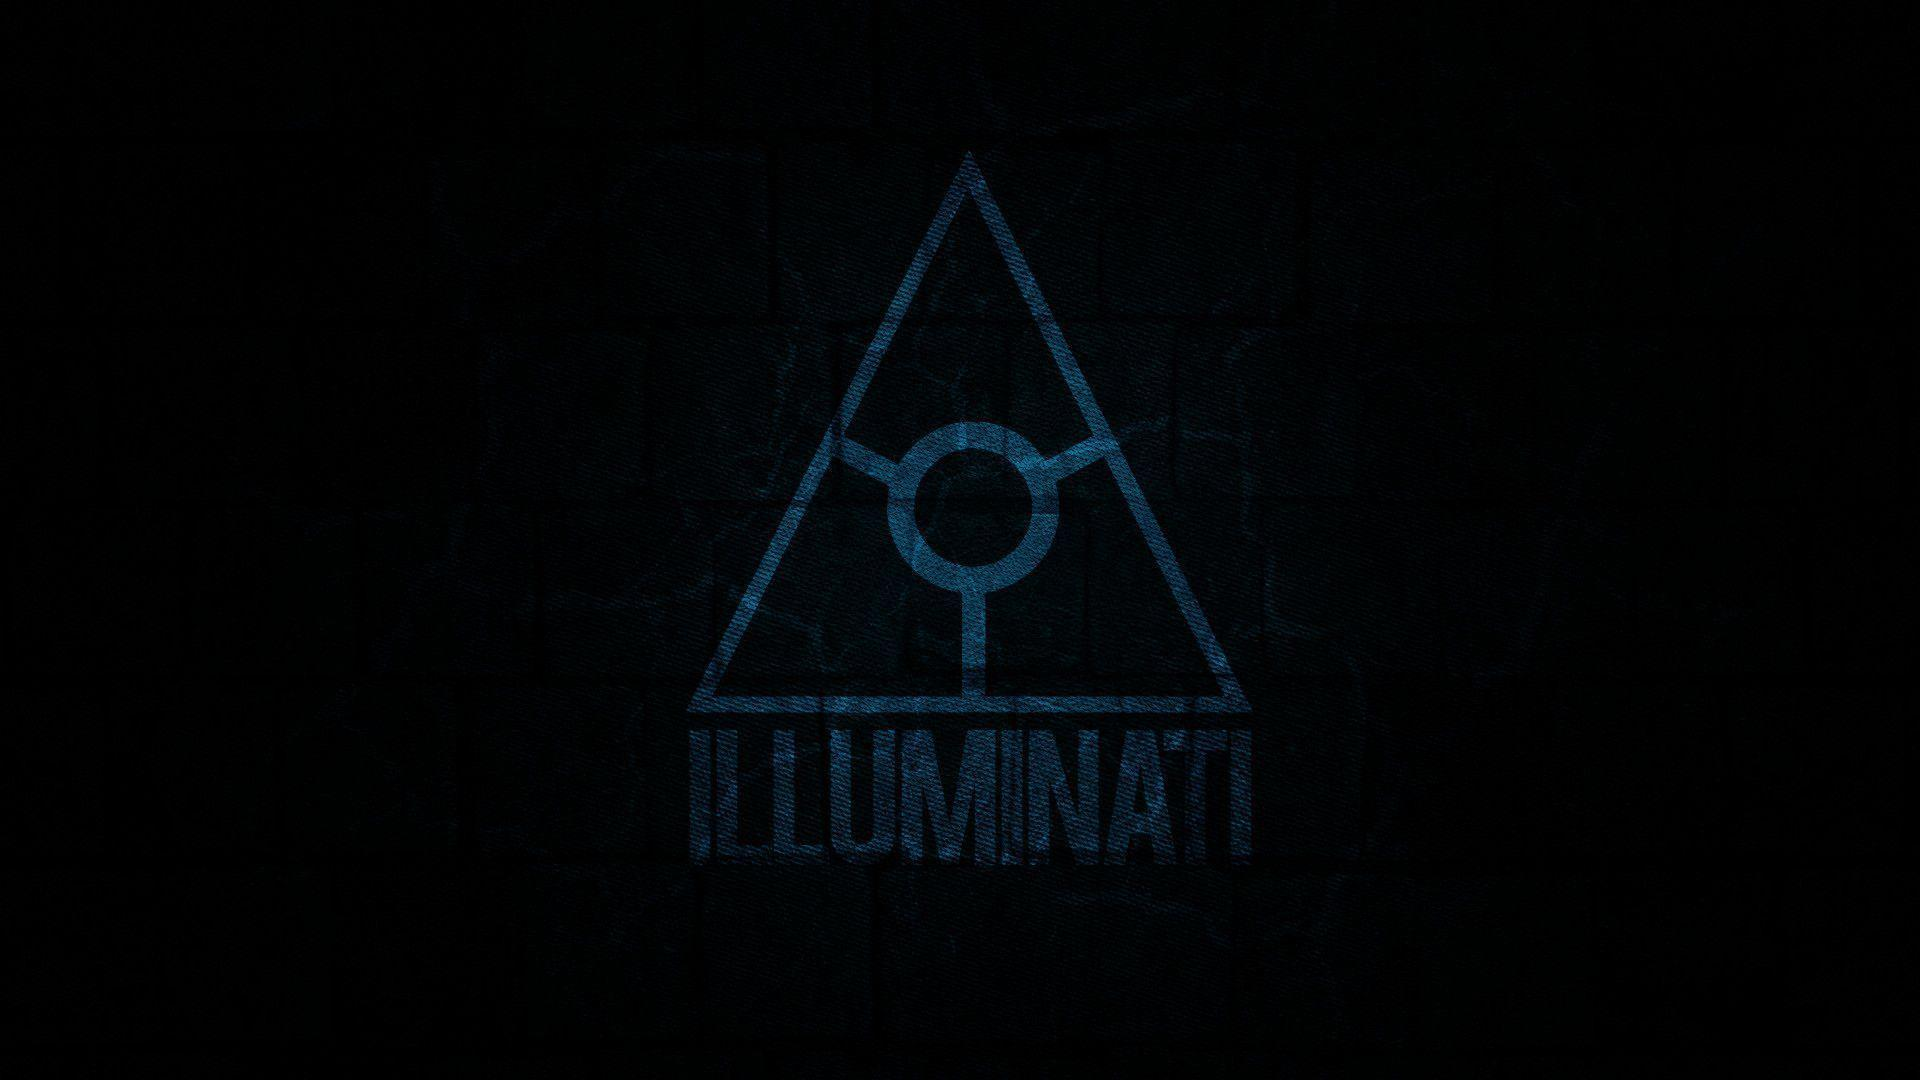 illuminati wallpapers wallpaper cave